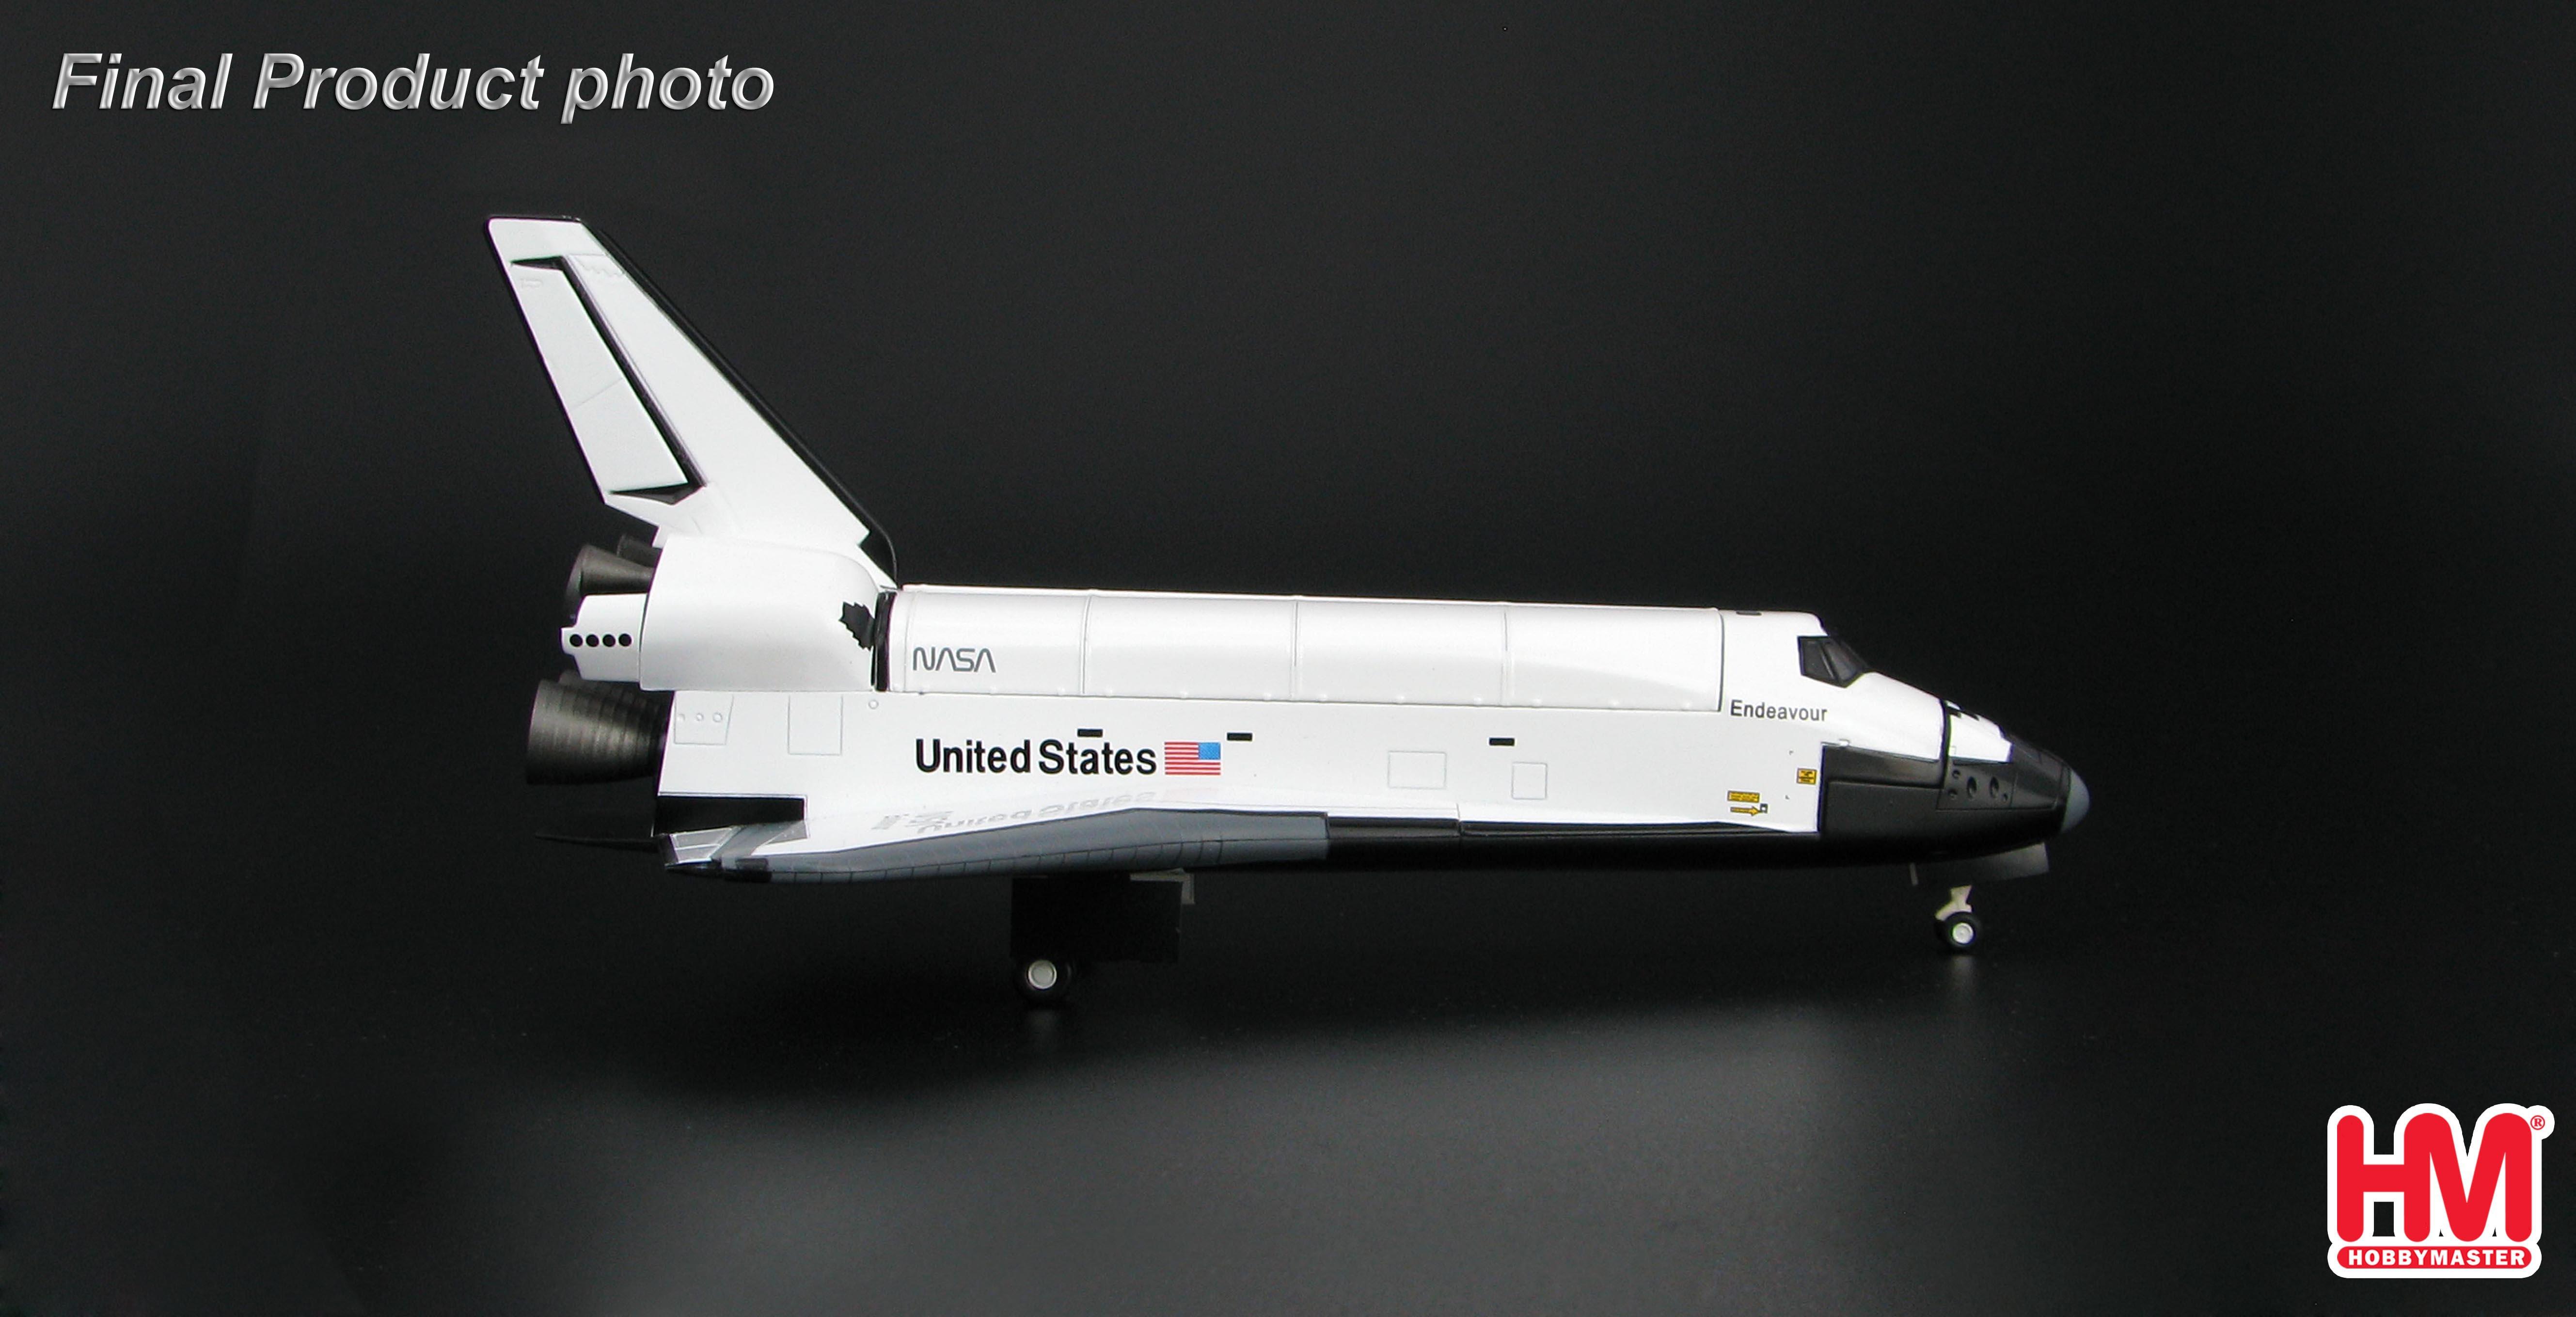 space shuttle endeavour 1992 - photo #37